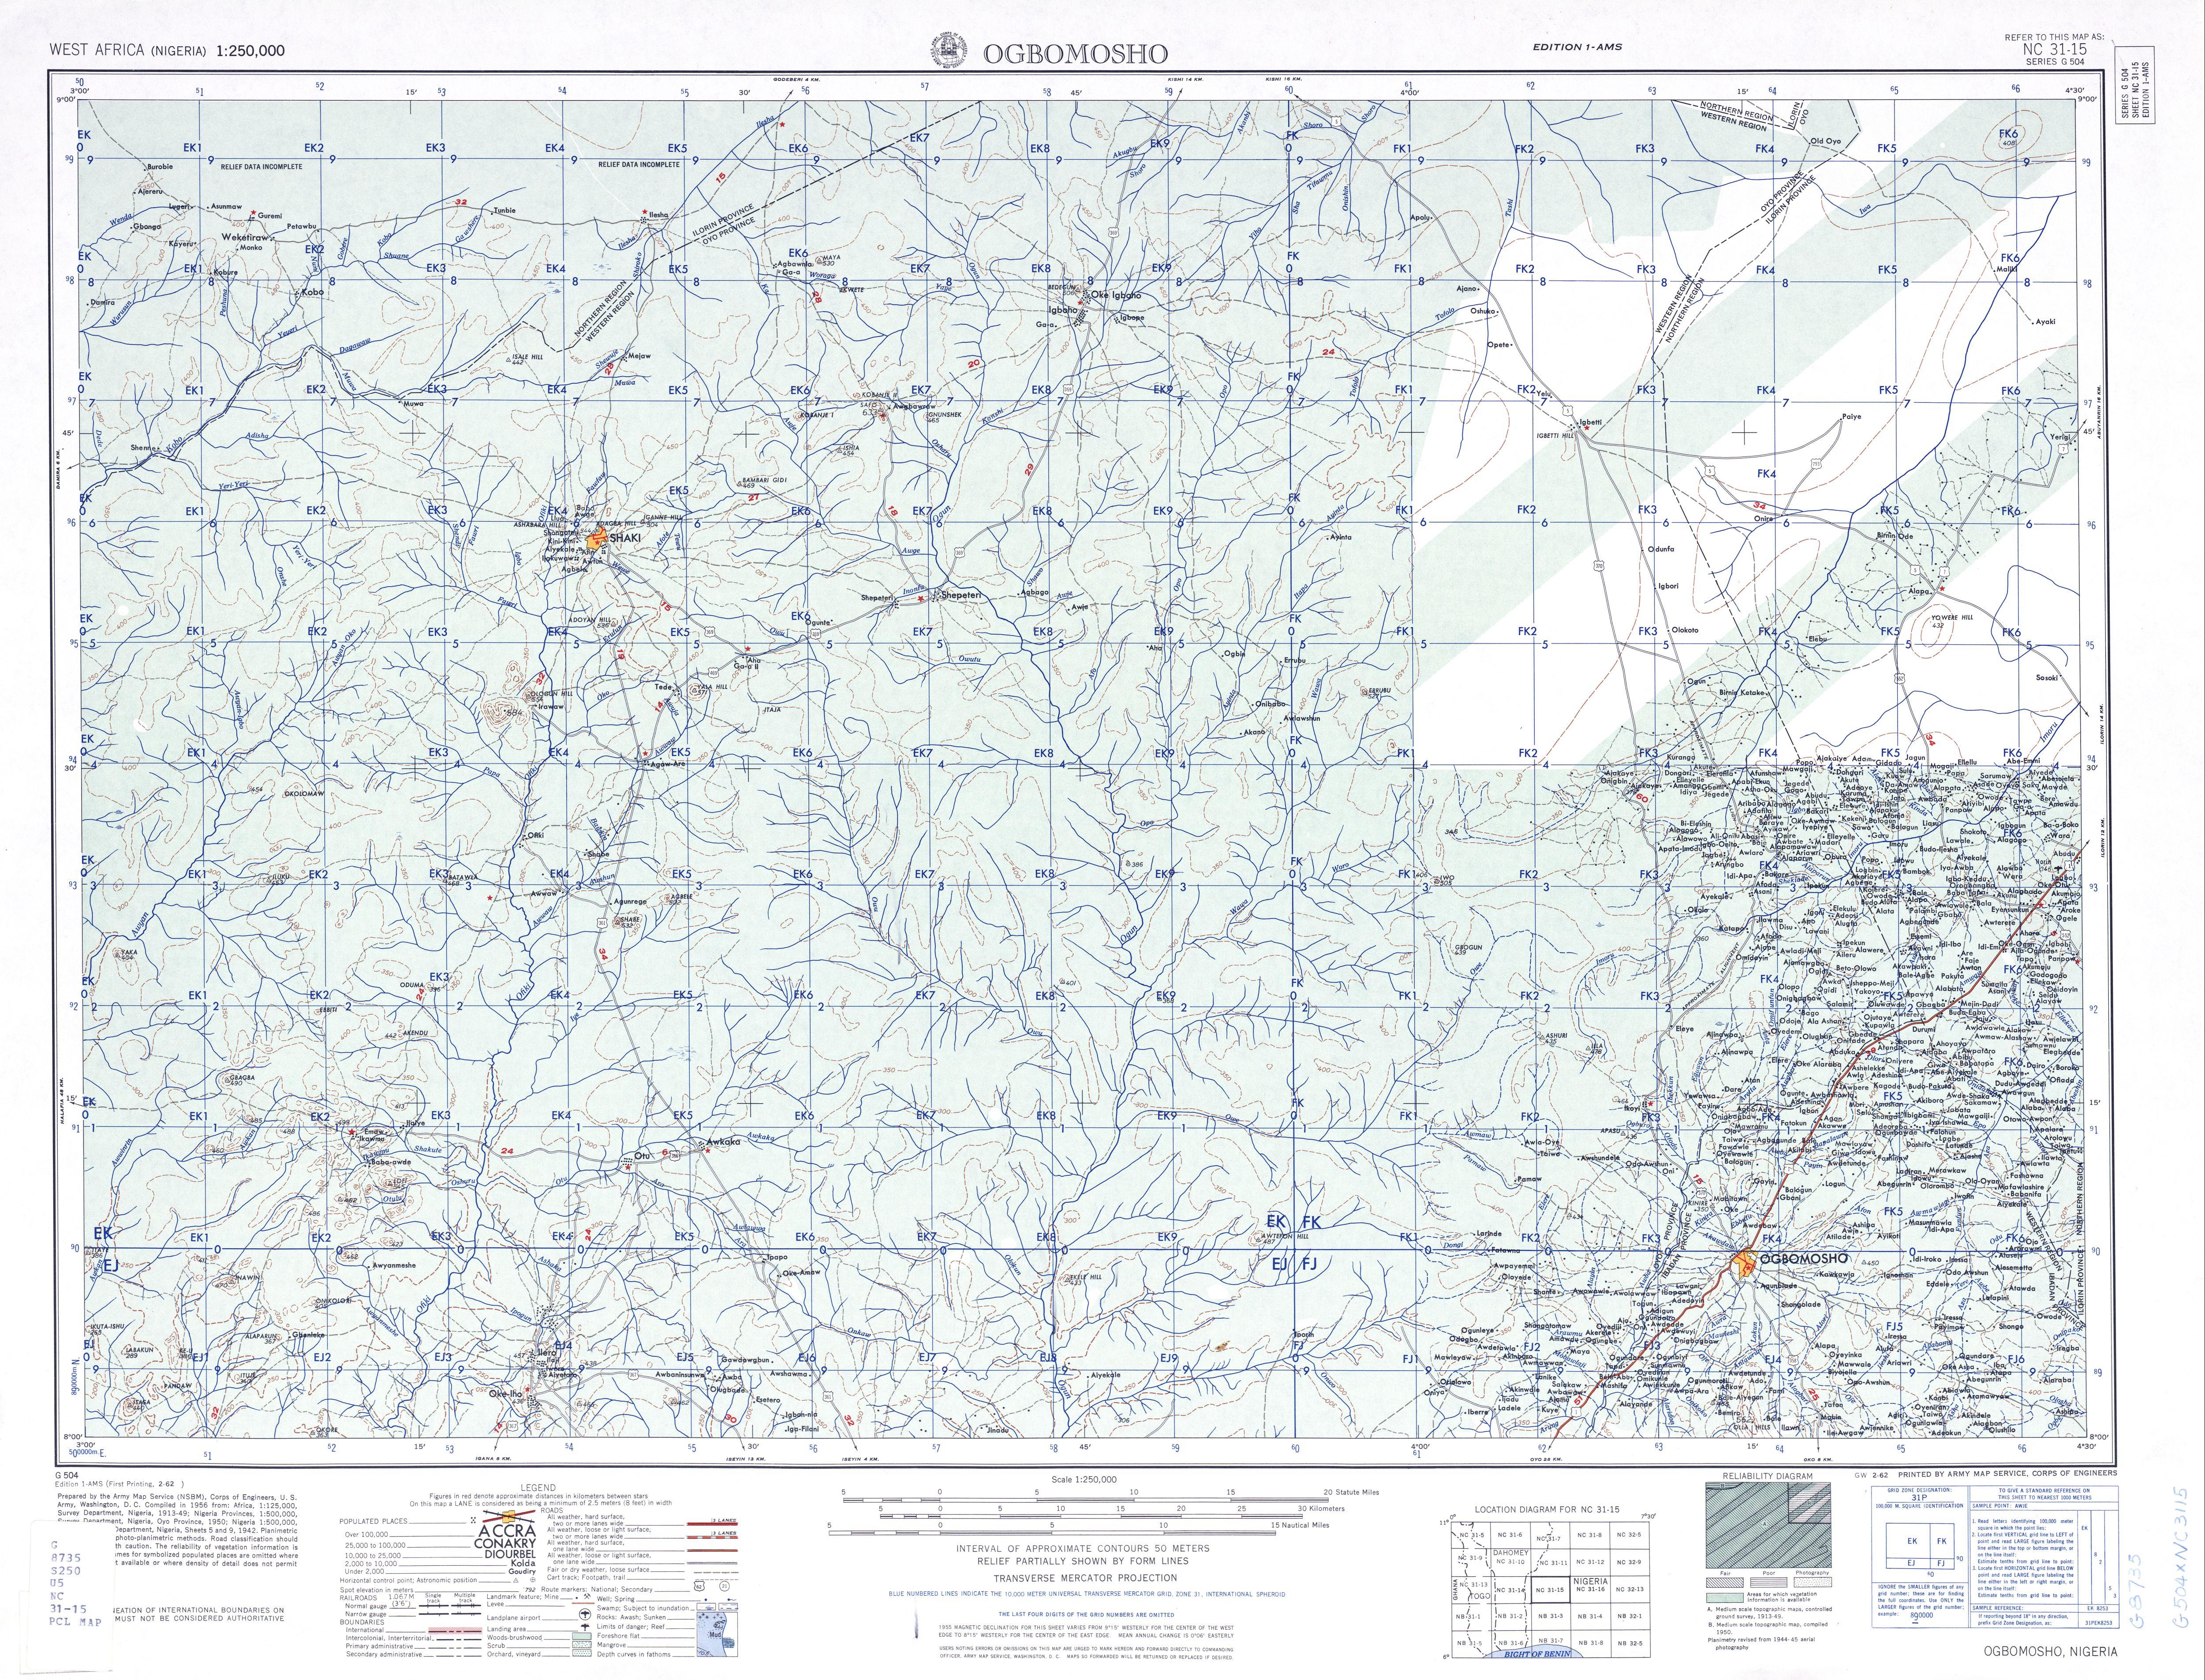 Hoja Ogbomosho del Mapa Topográfico de África Occidental 1955